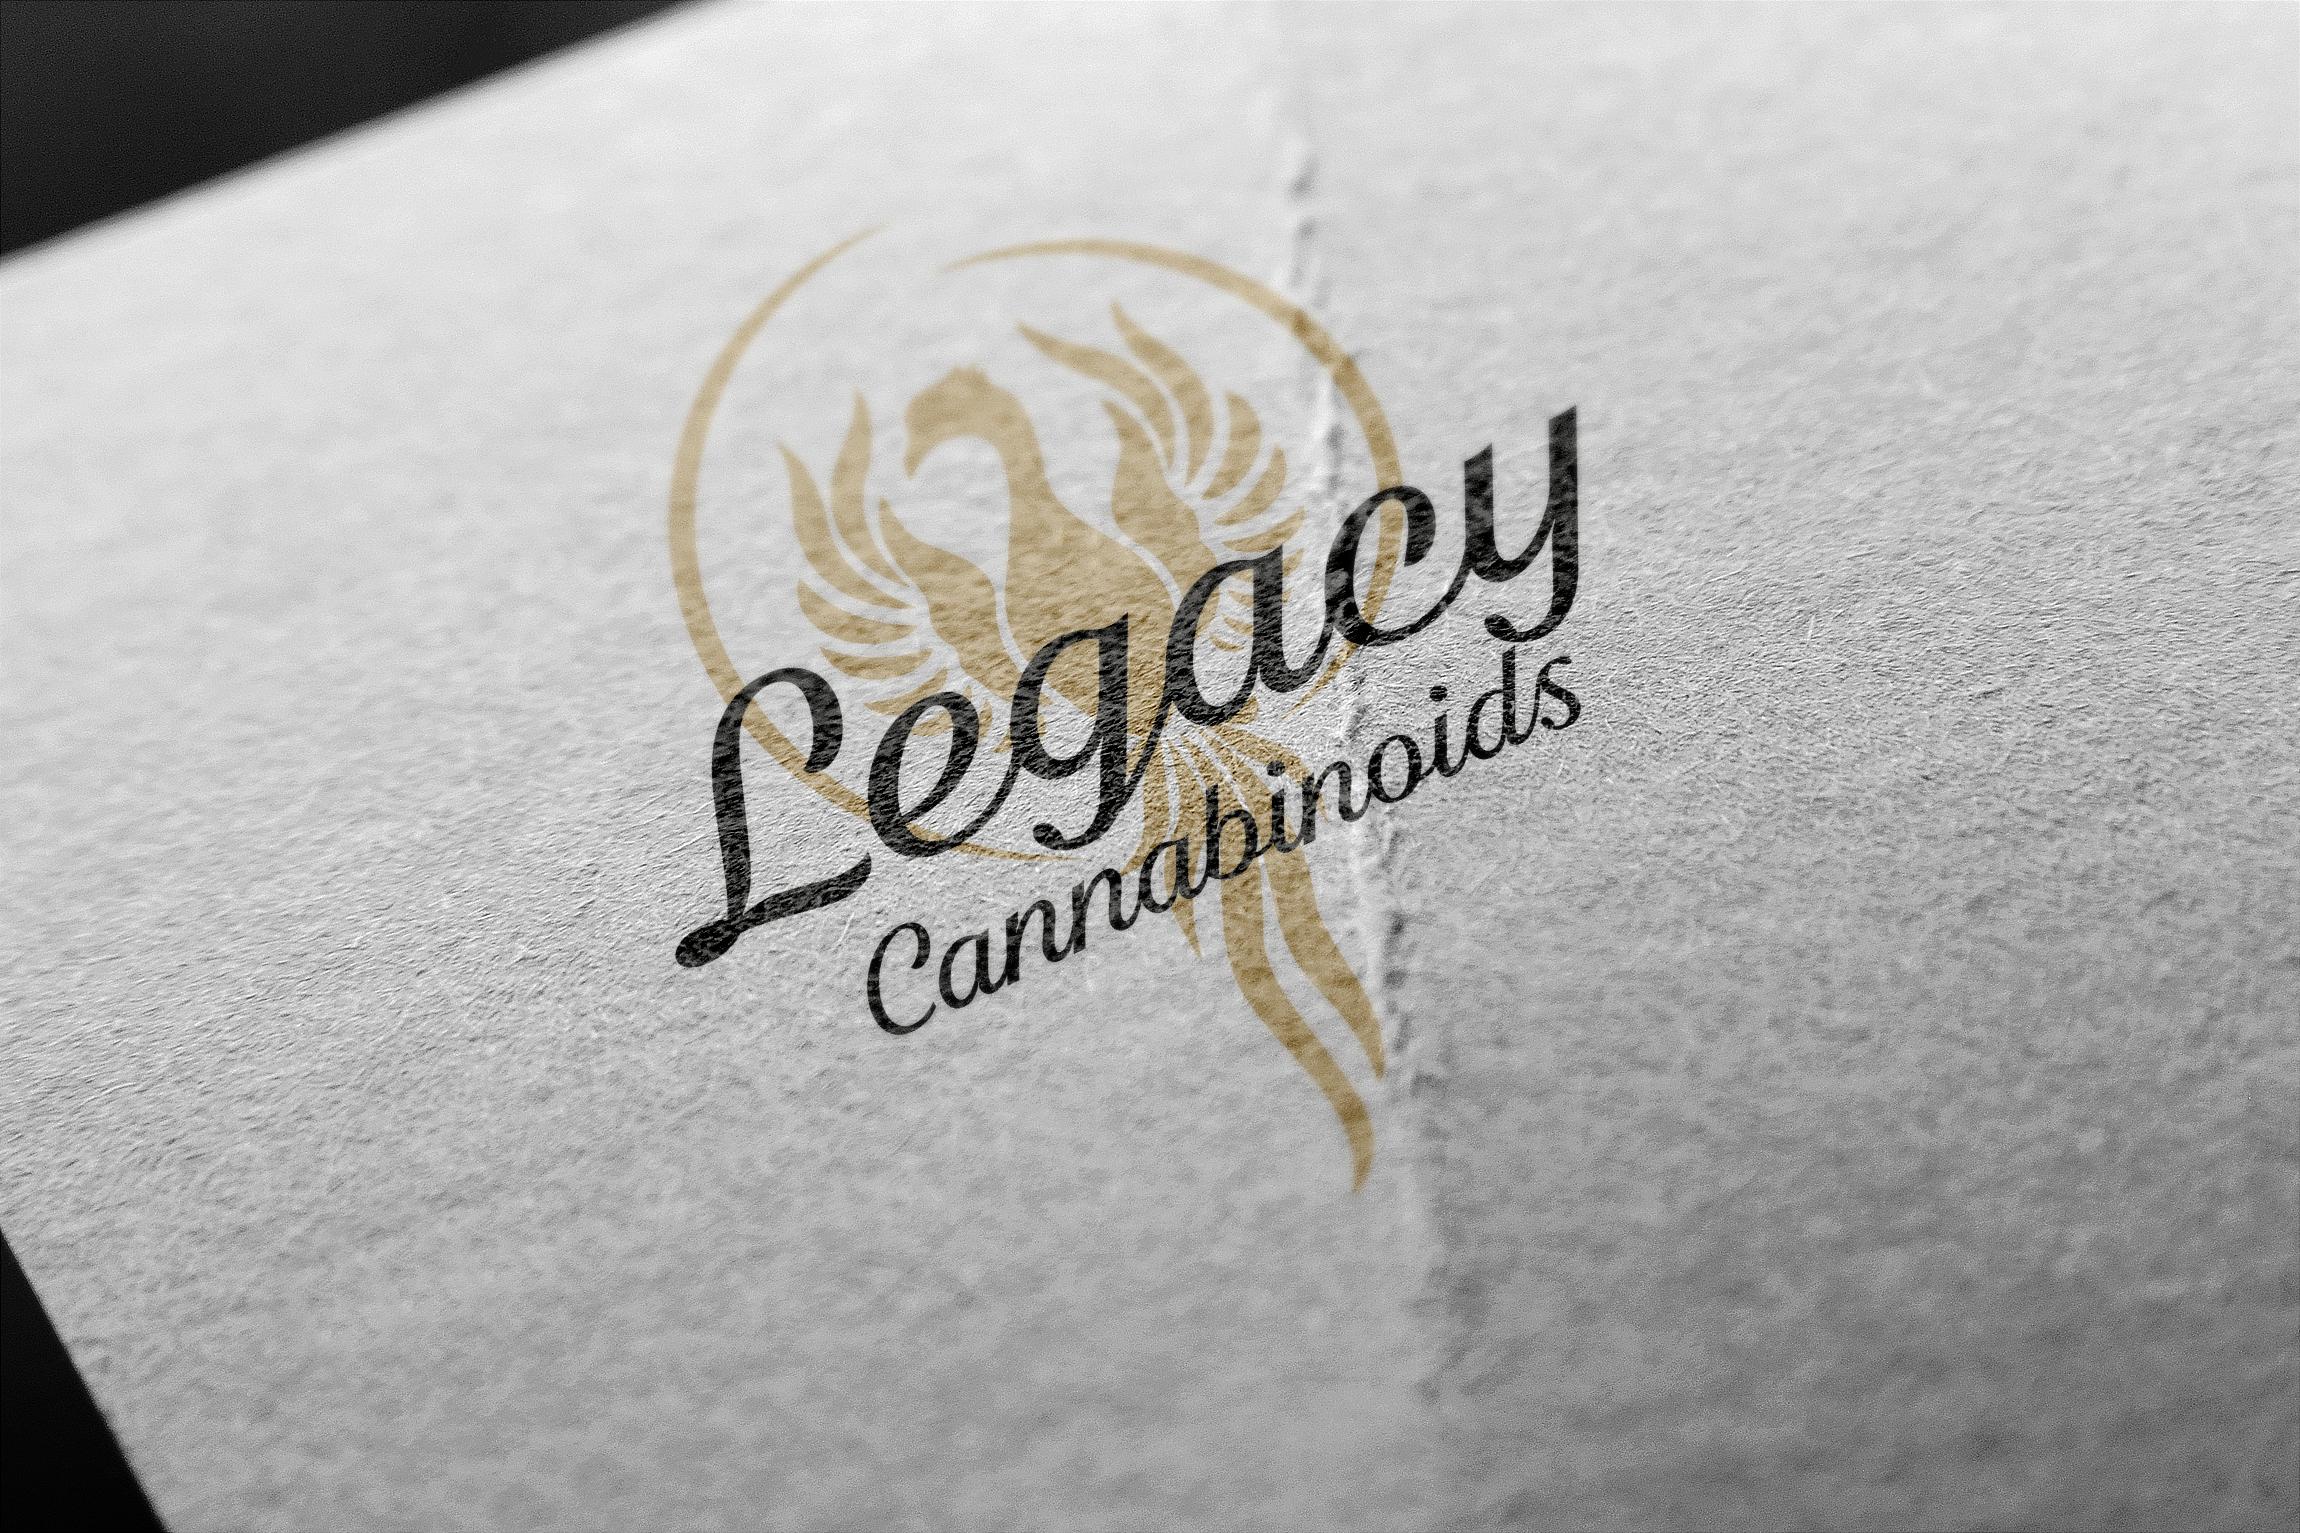 Legacy Cannabinoids